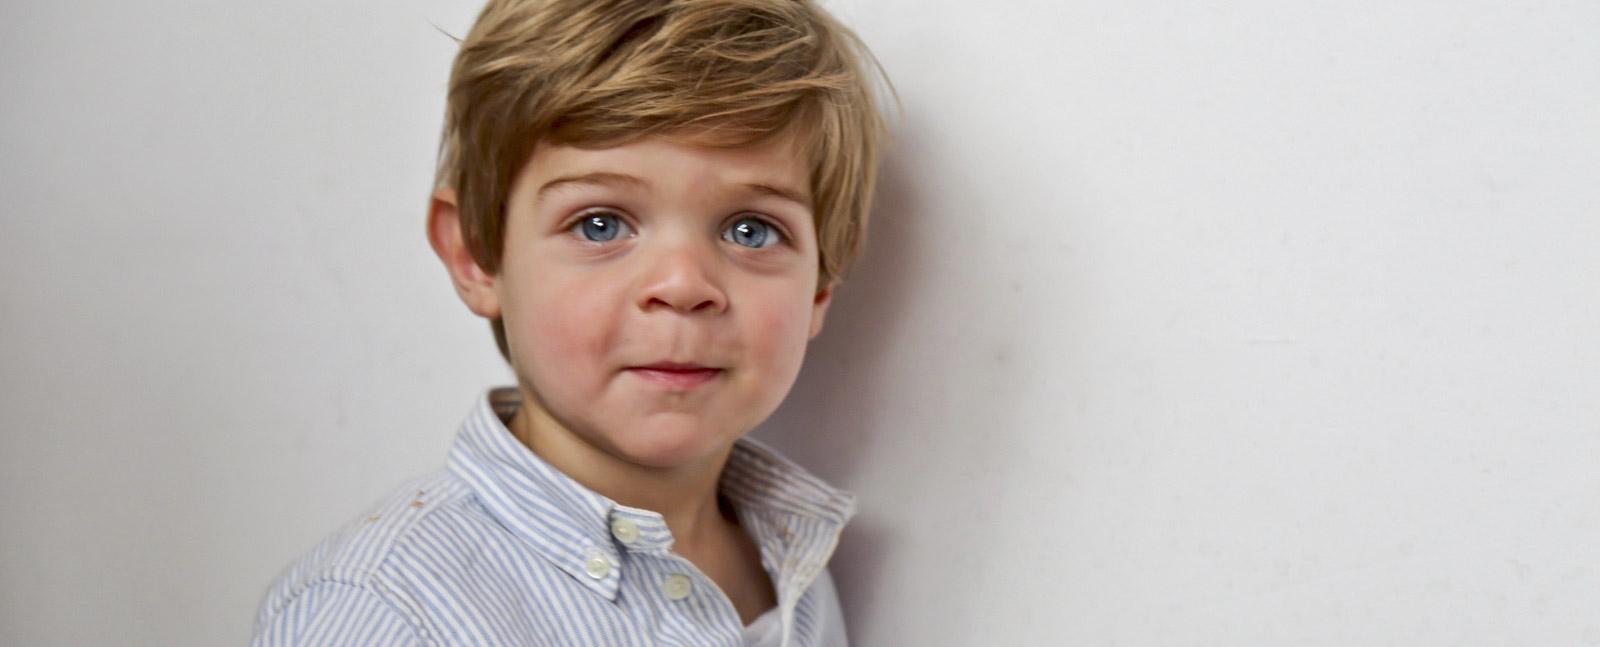 Child portrait photography Adelaide. Portrait photography.